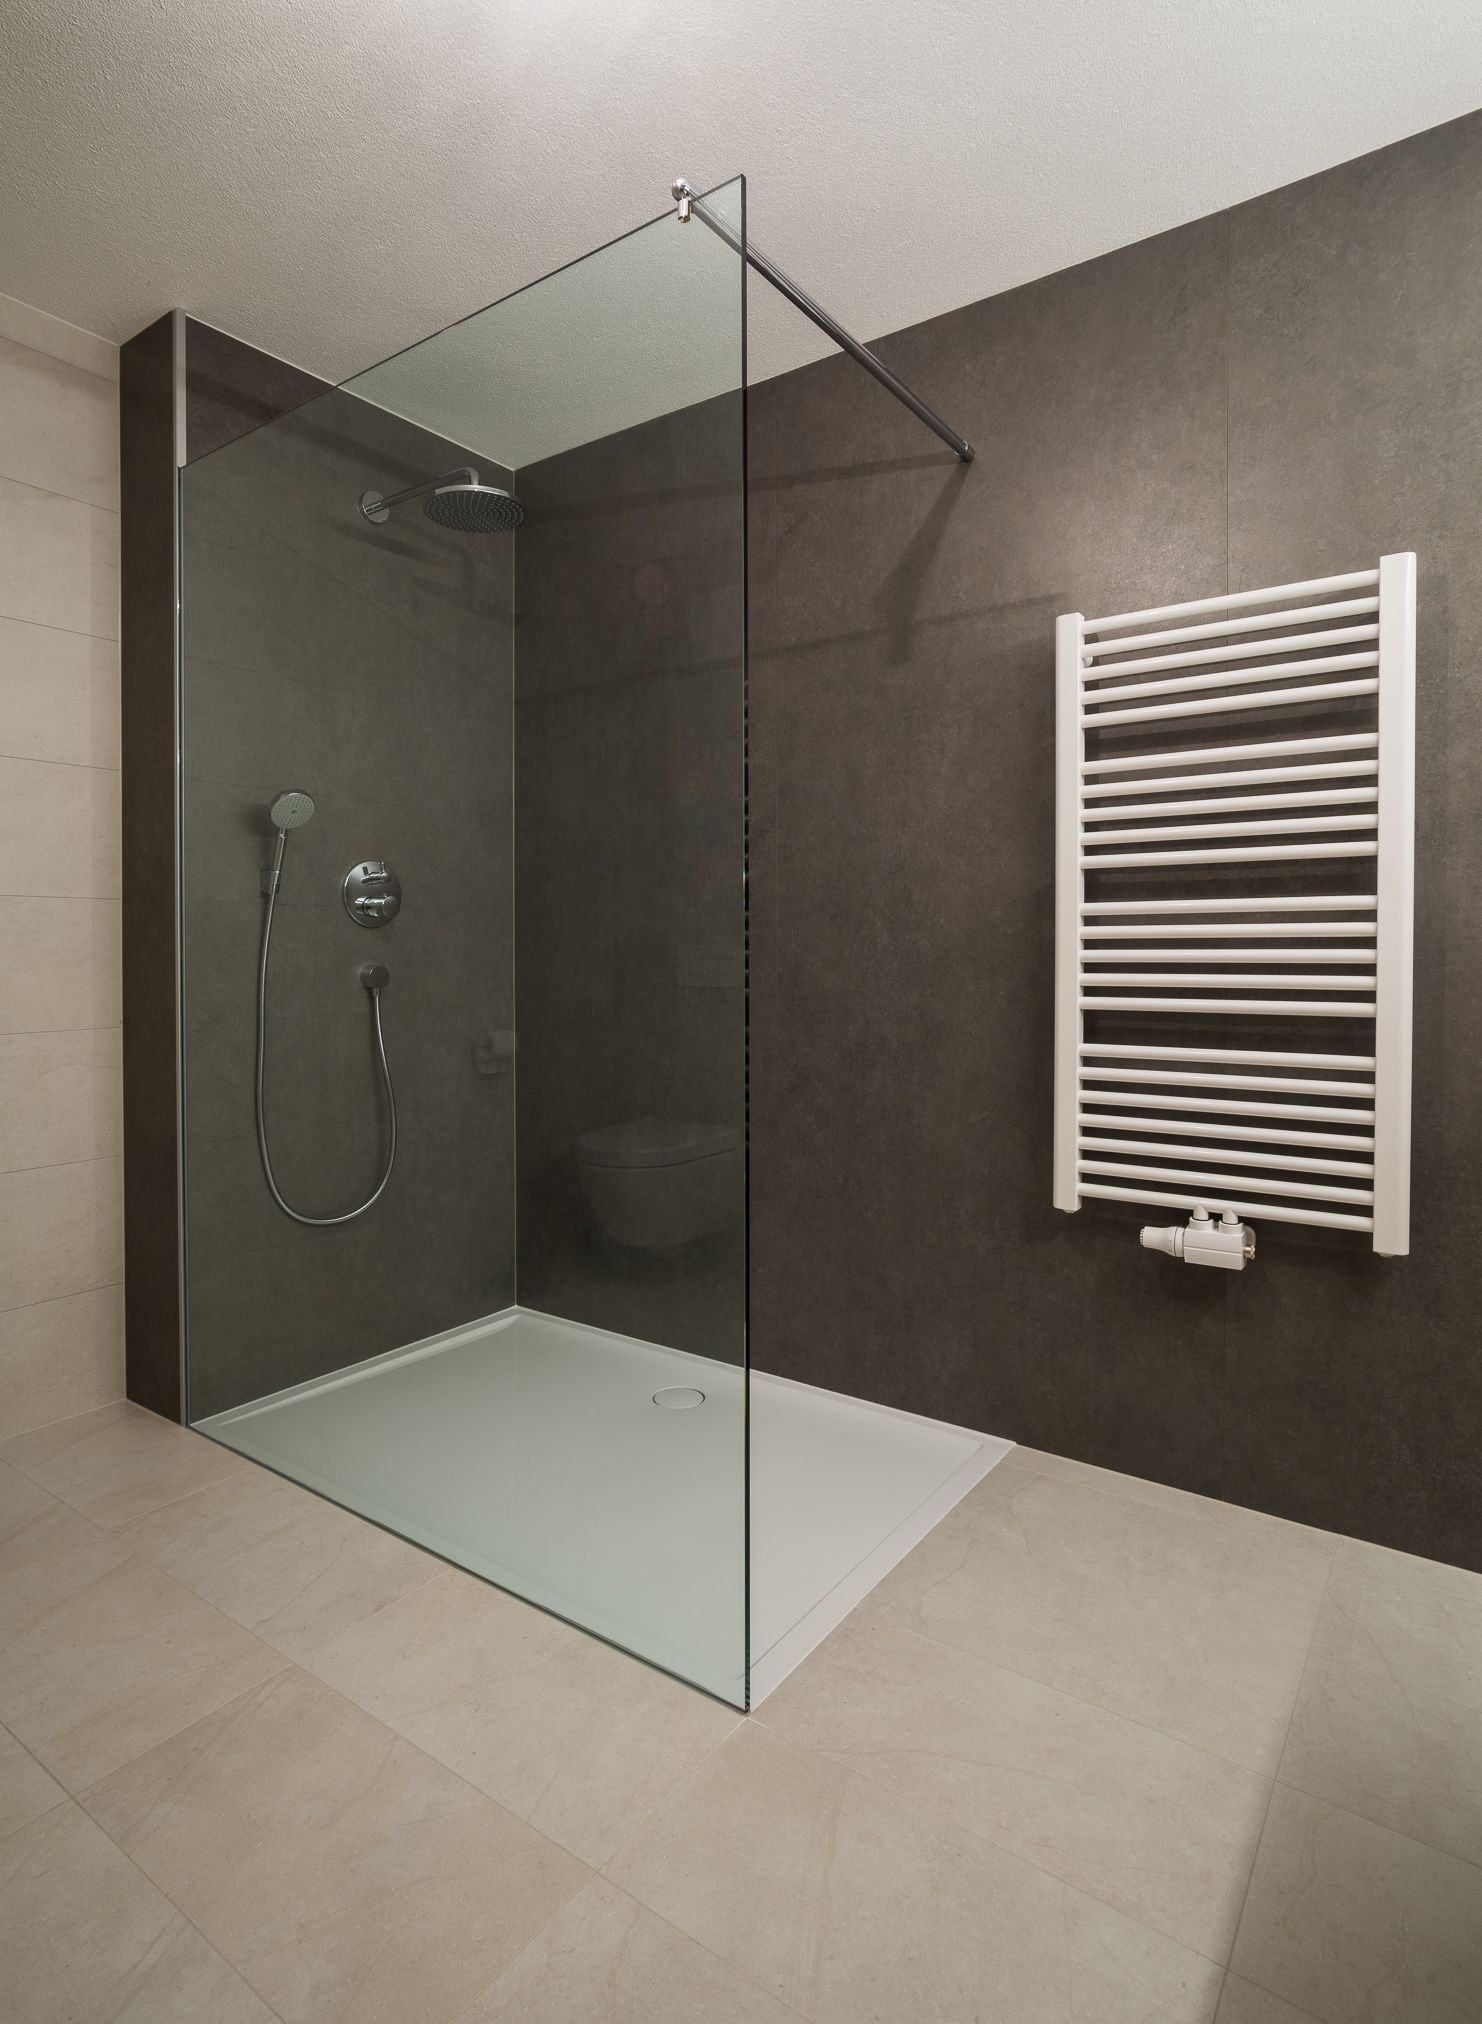 Großformate #Fliese #Design #Fliesenbau #Dusche | Home Decor that I ...